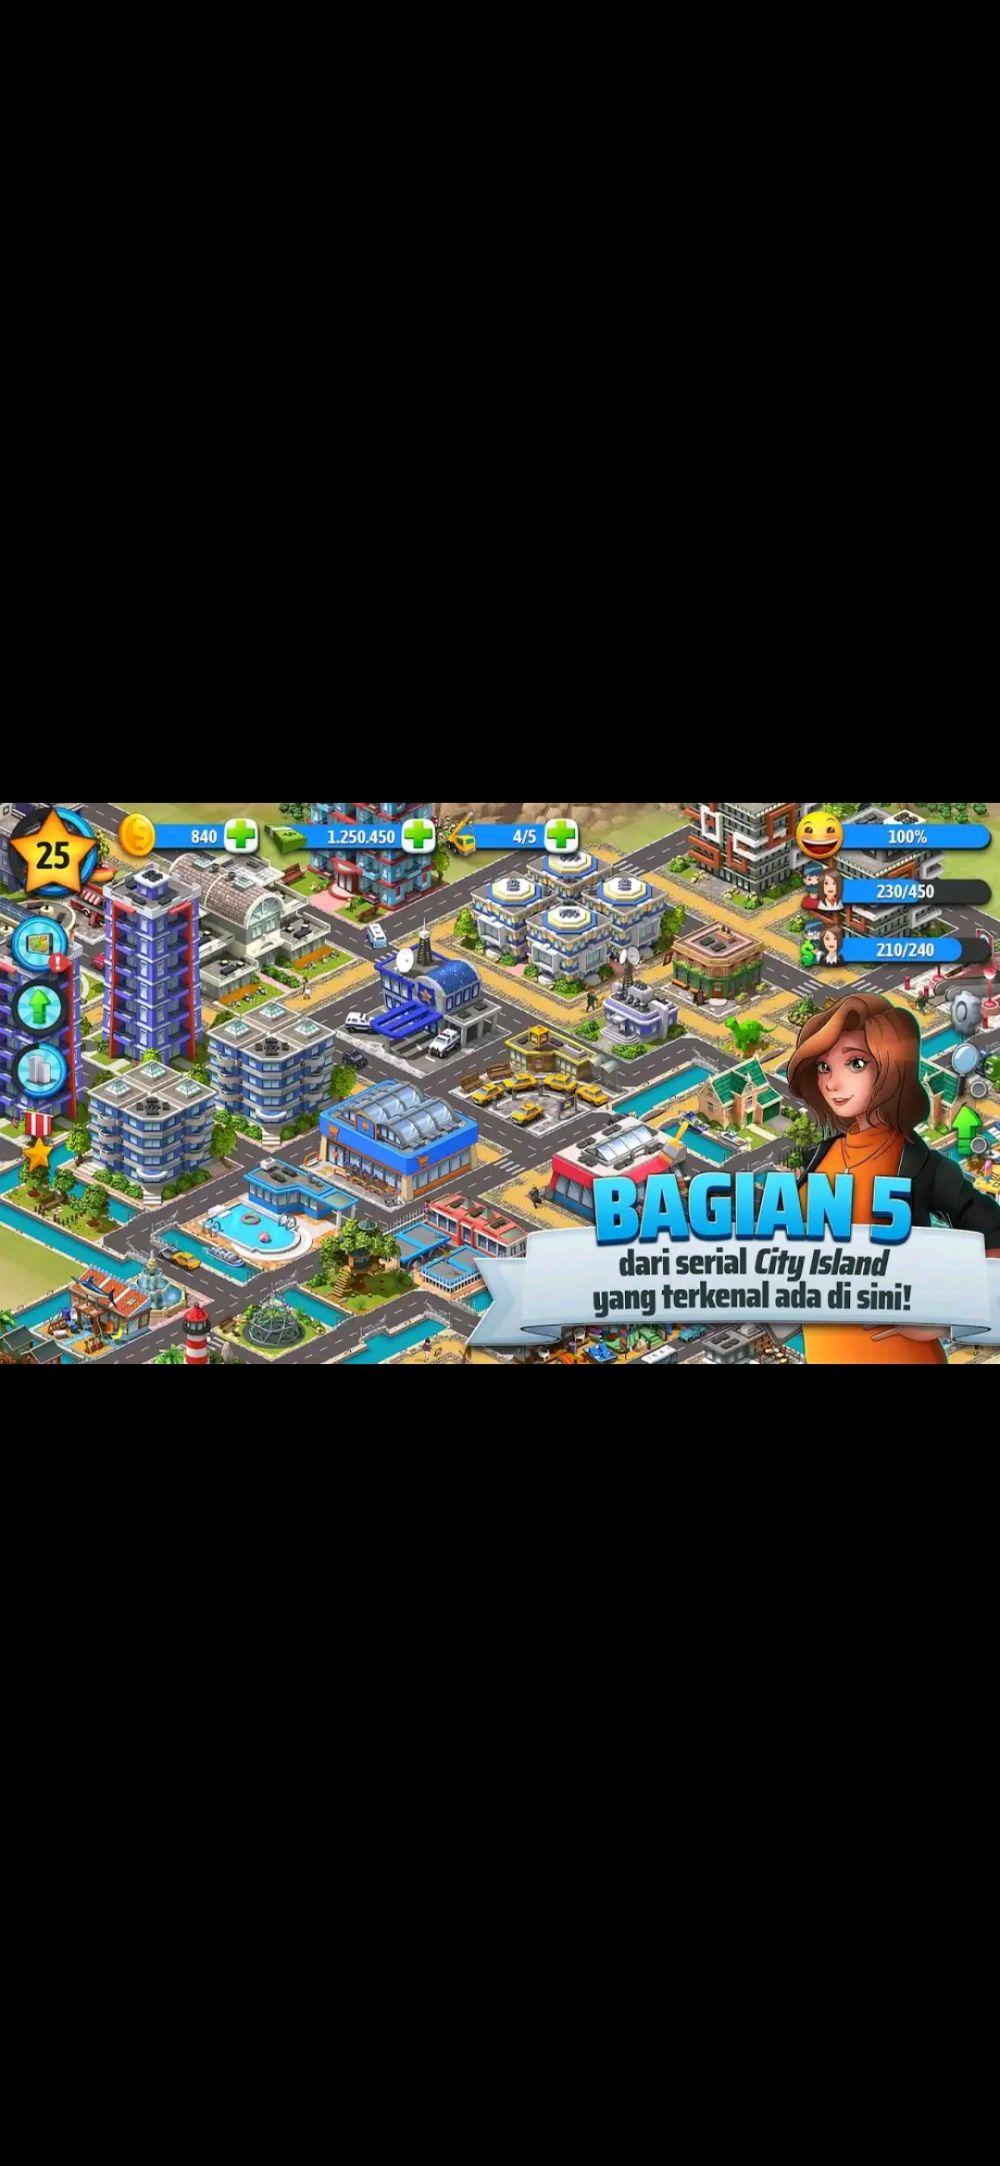 10 Game offline strategi terbaik di Android, bikin asah otak © 2019 brilio.net